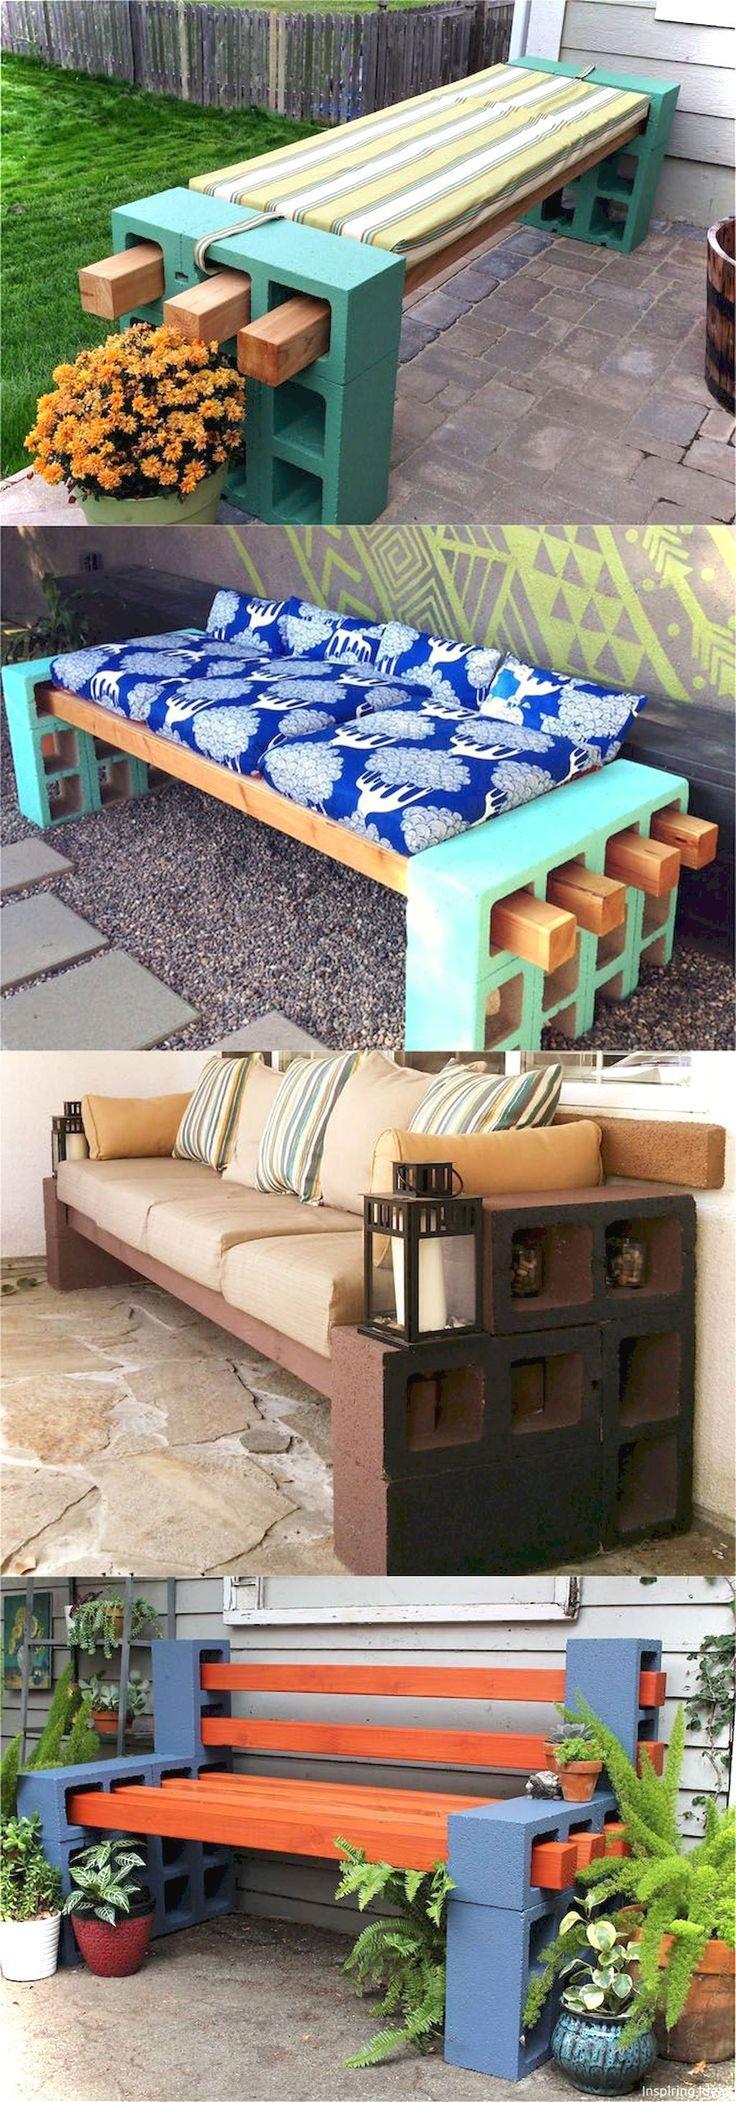 87 best Garden Benches images on Pinterest